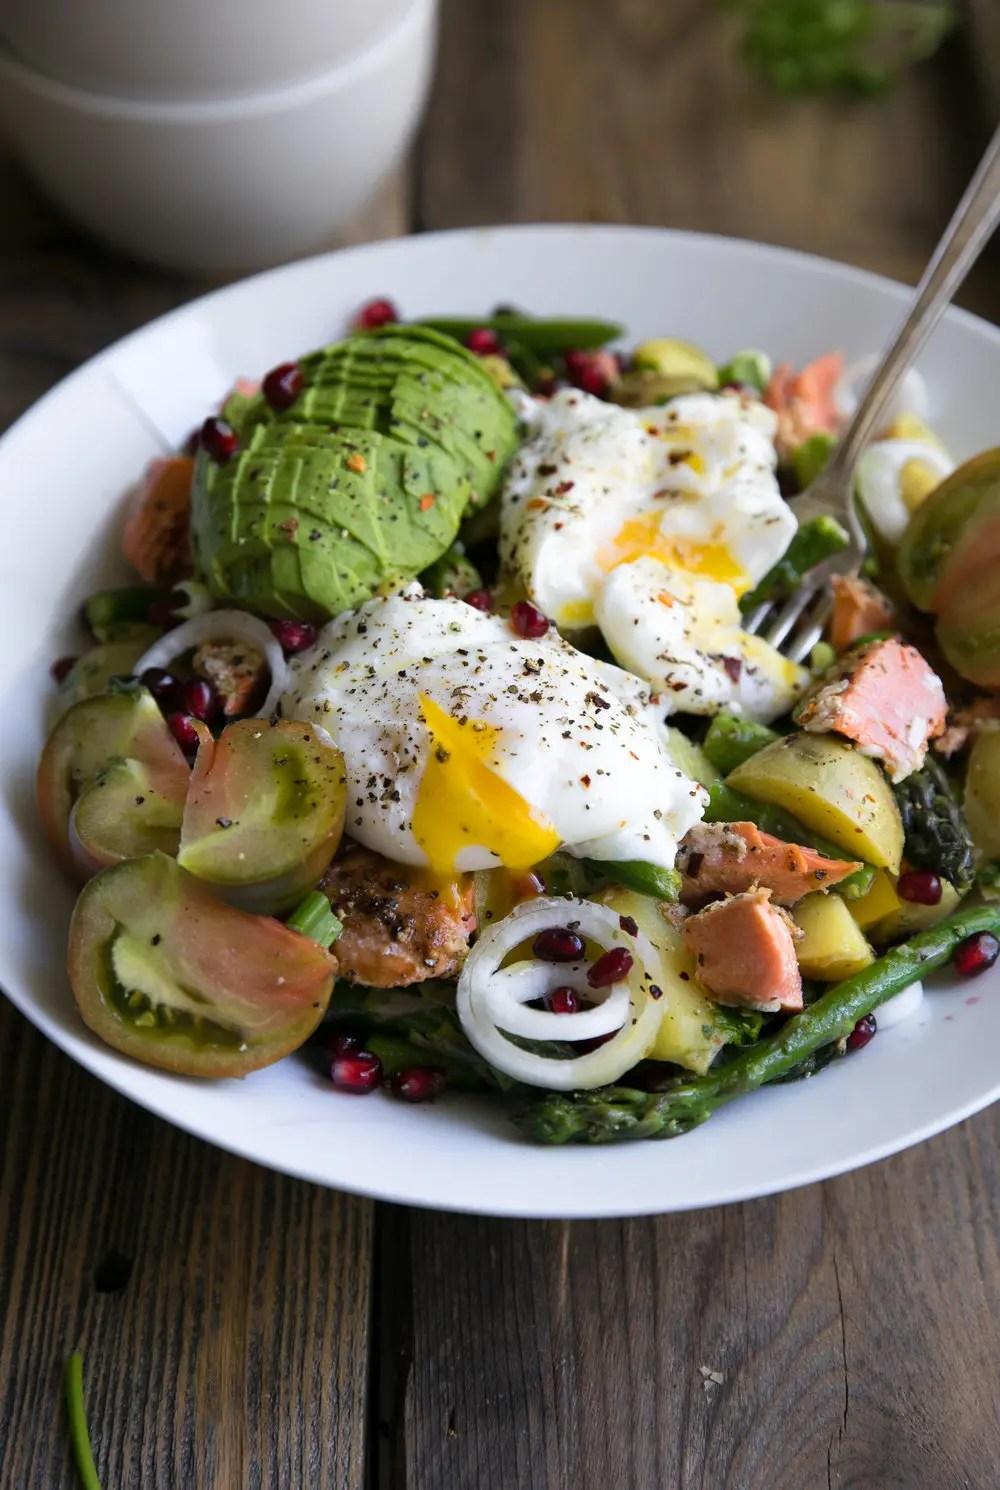 Easy Asparagus and Avocado Potato Salad with Poached Egg and Salmon